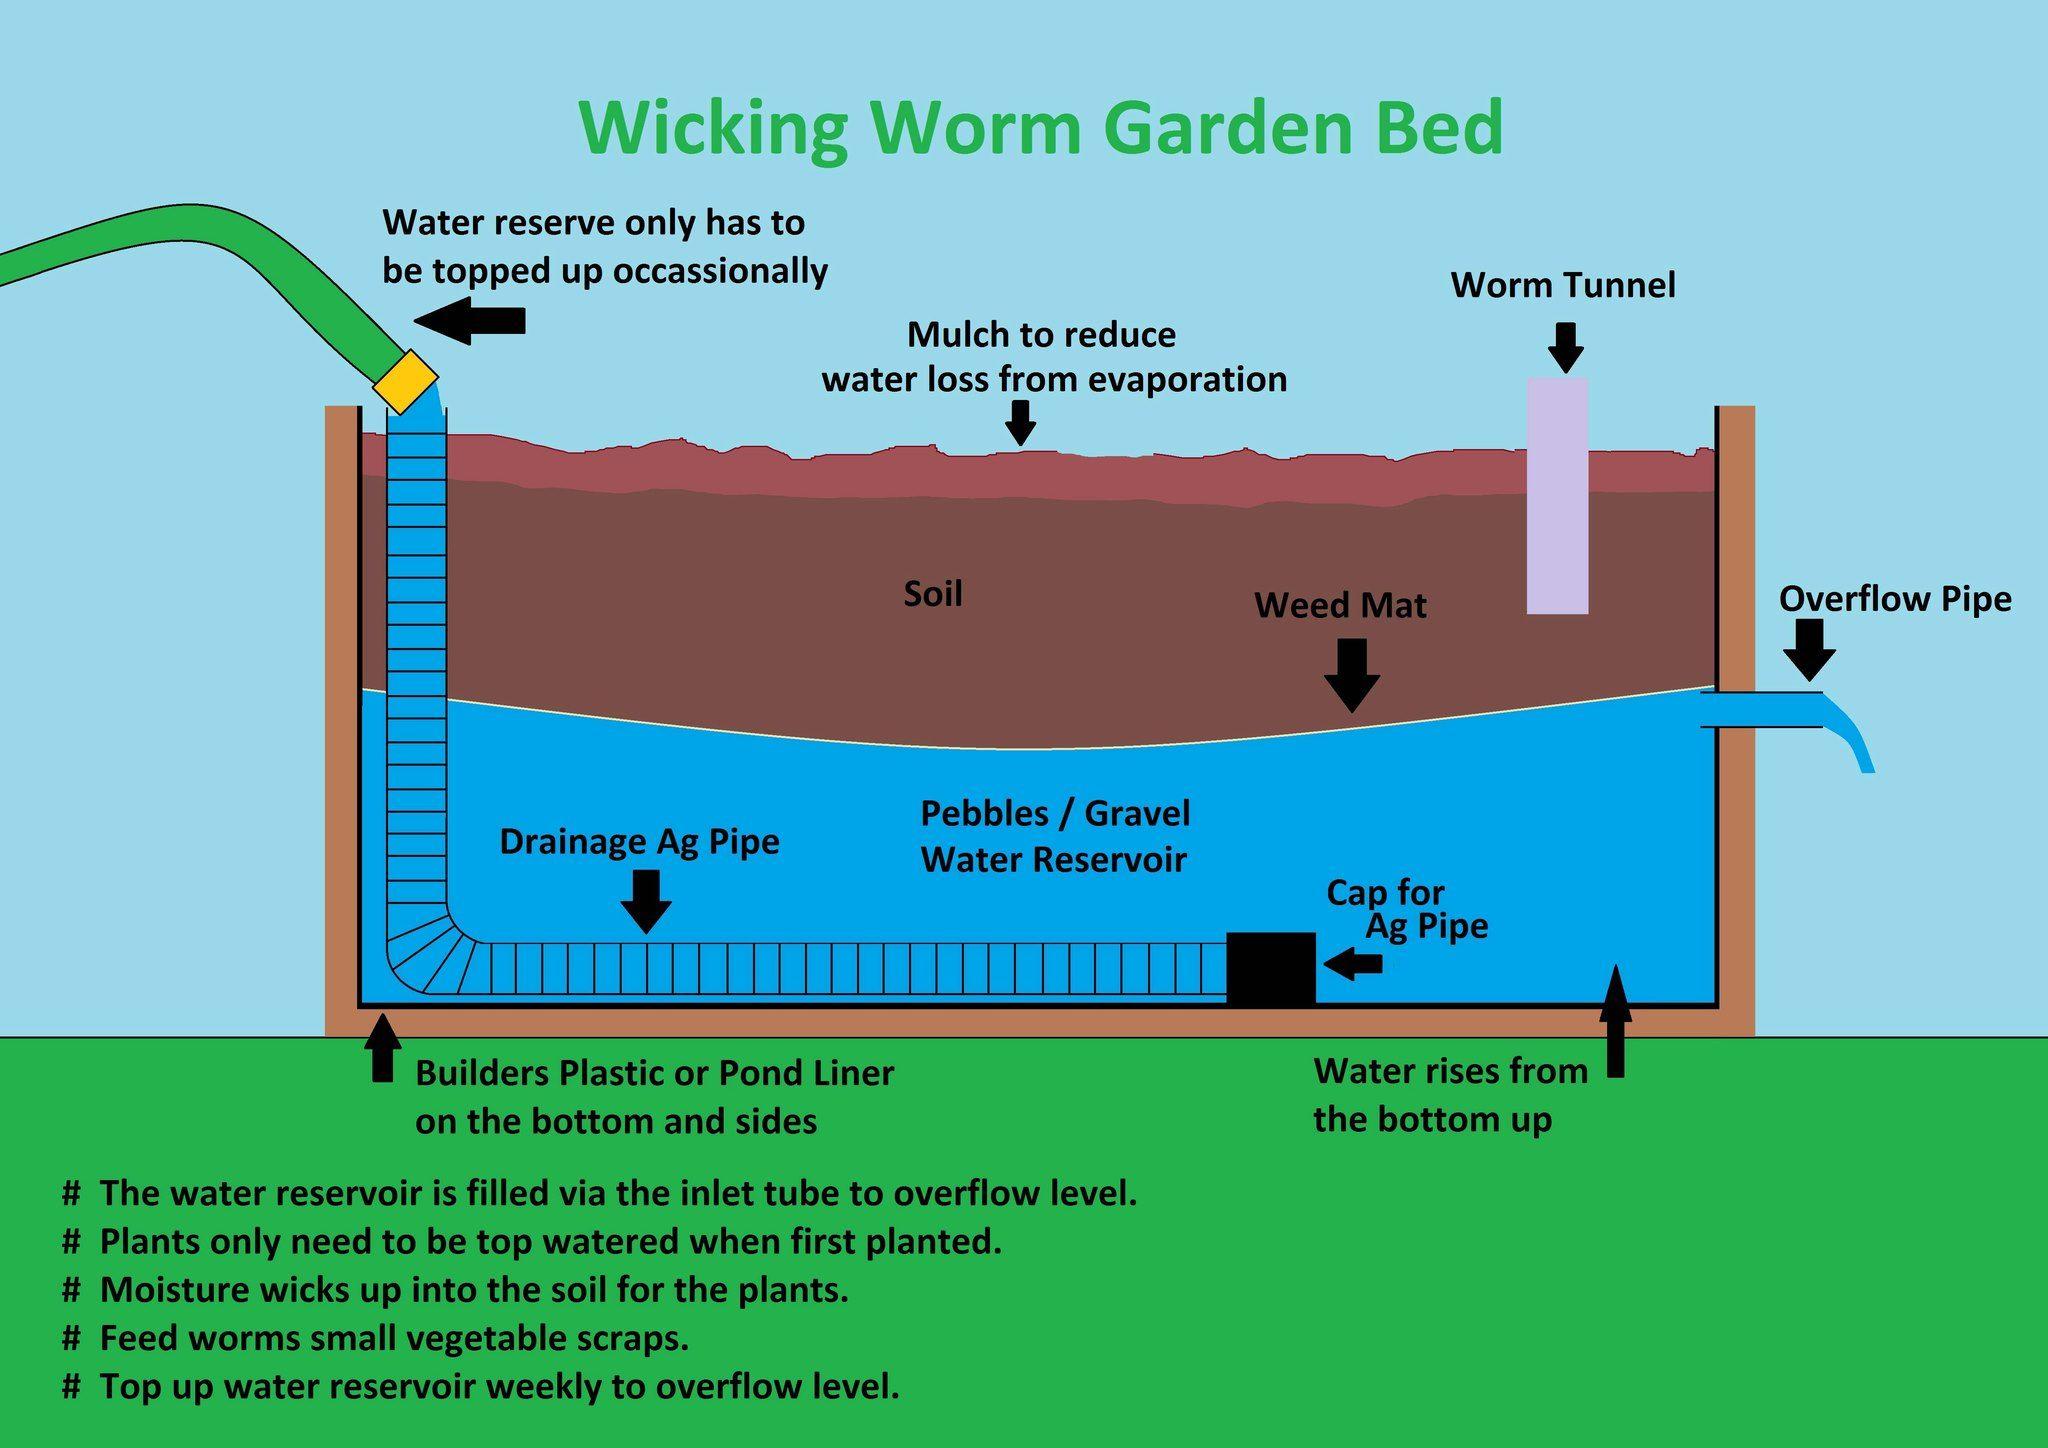 Worm Farm Aquaponics Wicking Beds Garden Beds